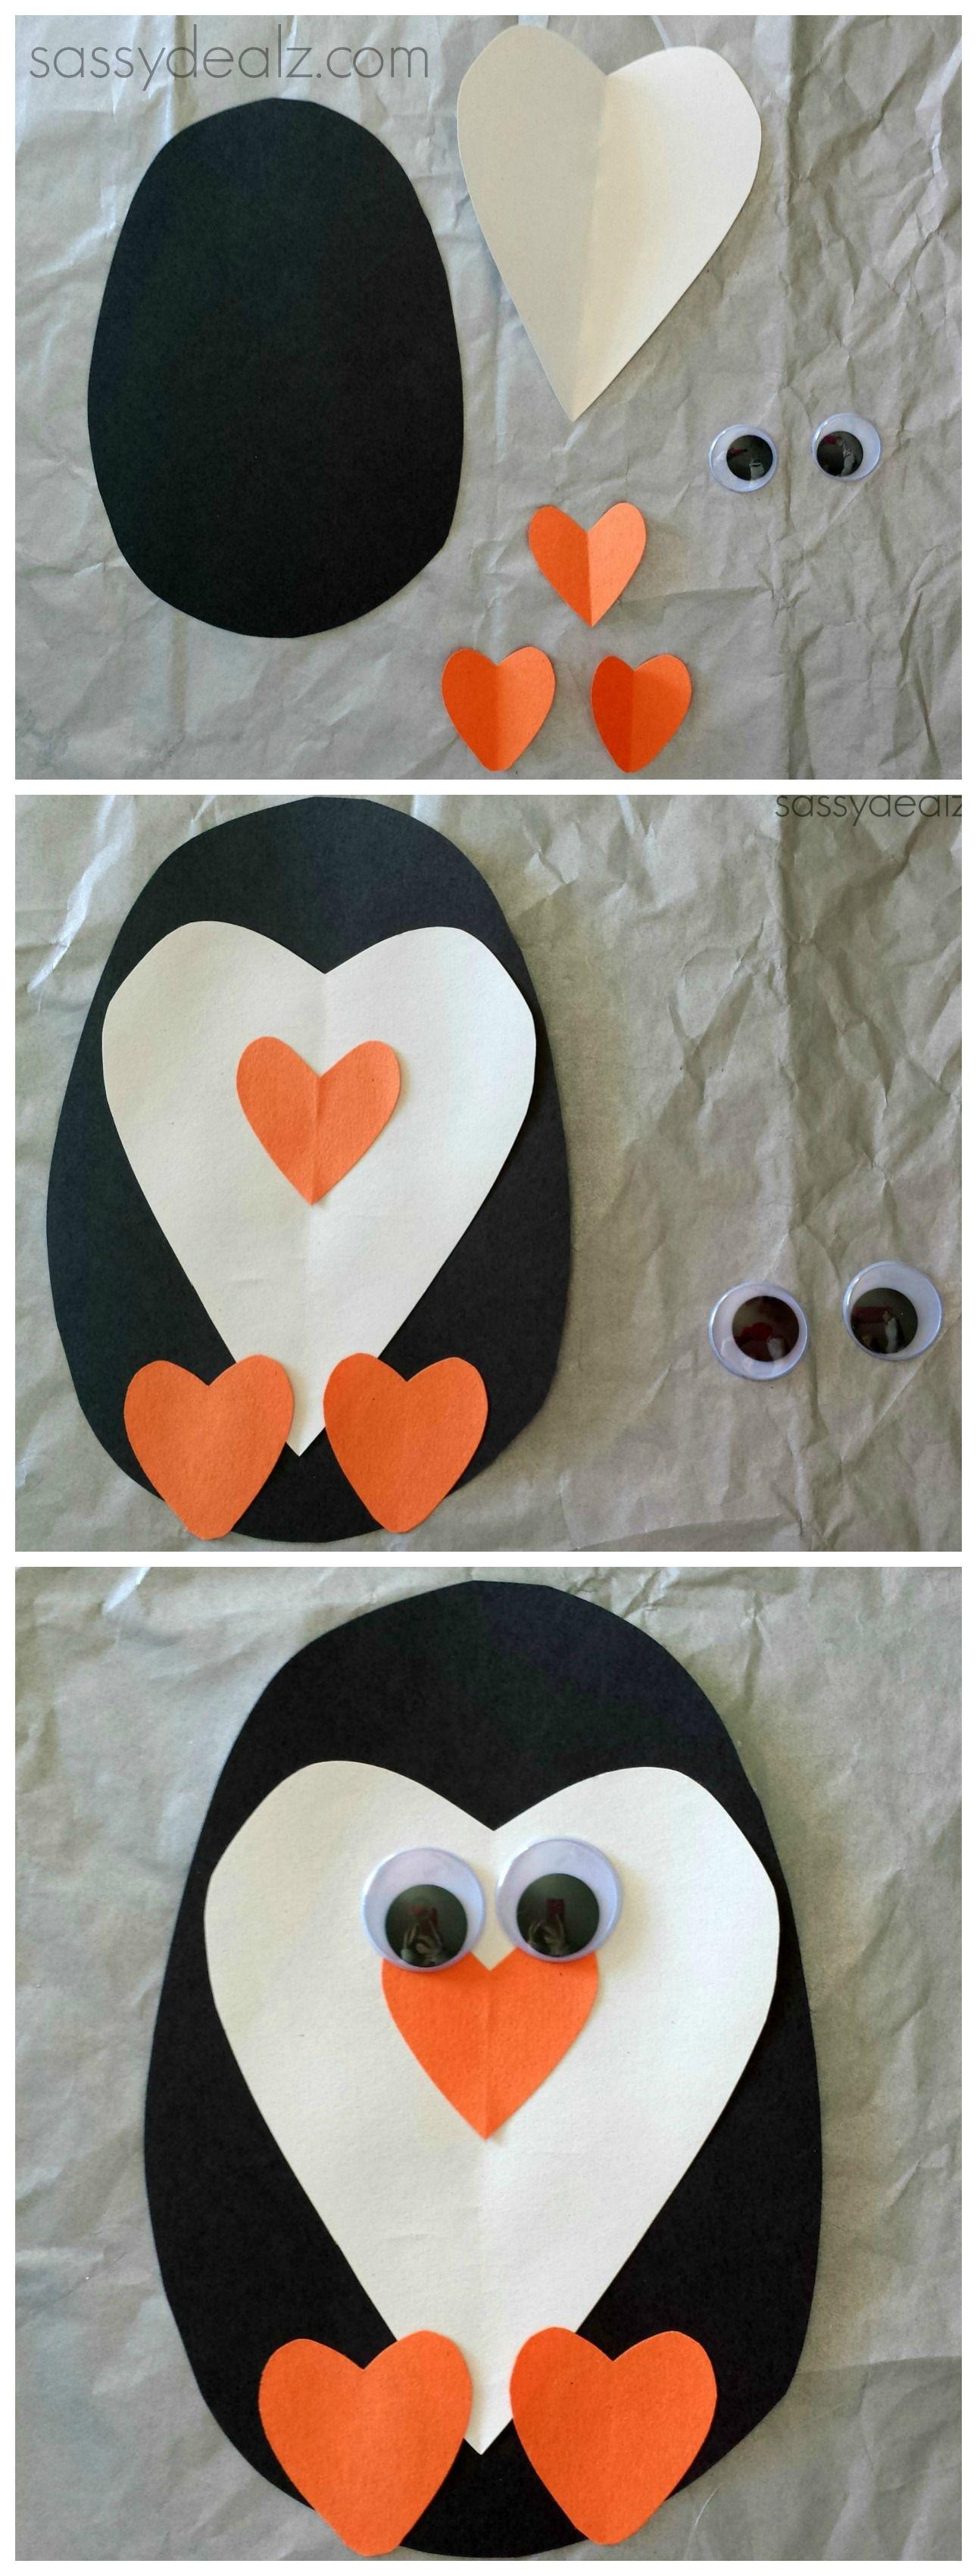 Paper Heart Penguin Craft For Kids Valentines craft DIY heart